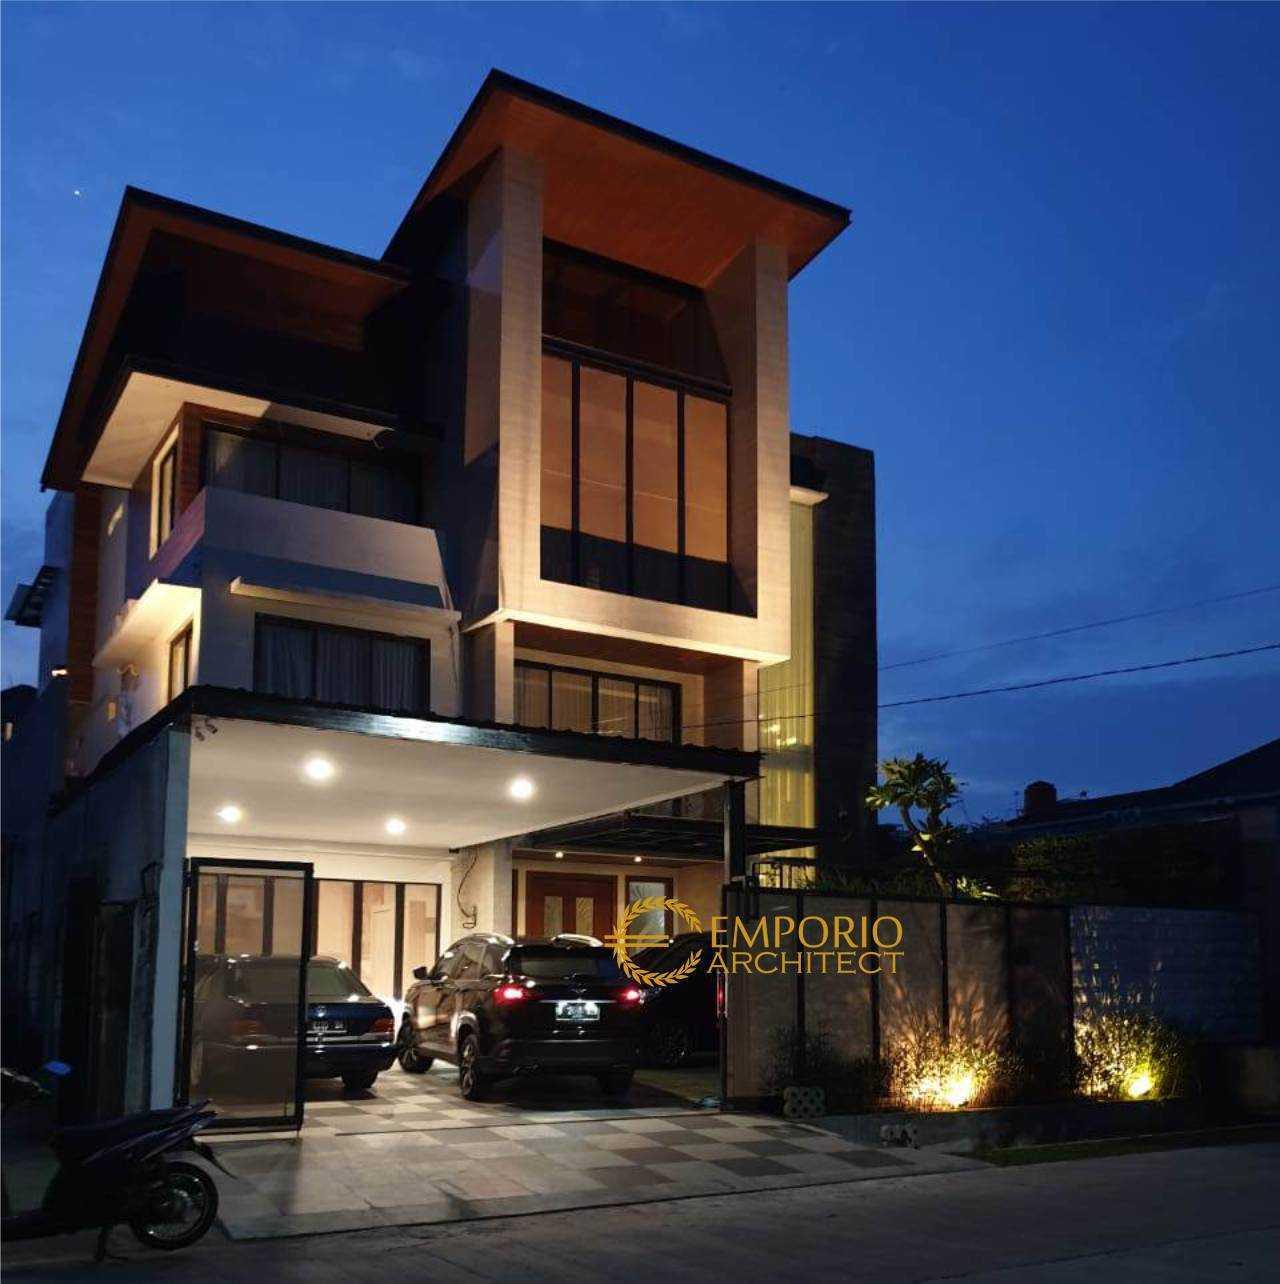 Emporio Architect Jasa Arsitek Jakarta Hasil Konstruksi Rumah Modern Tropis 489 @ Jakarta Jakarta, Daerah Khusus Ibukota Jakarta, Indonesia Jakarta, Daerah Khusus Ibukota Jakarta, Indonesia Emporio-Architect-Jasa-Arsitek-Jakarta-Hasil-Konstruksi-Rumah-Modern-Tropis-489-Jakarta   90358